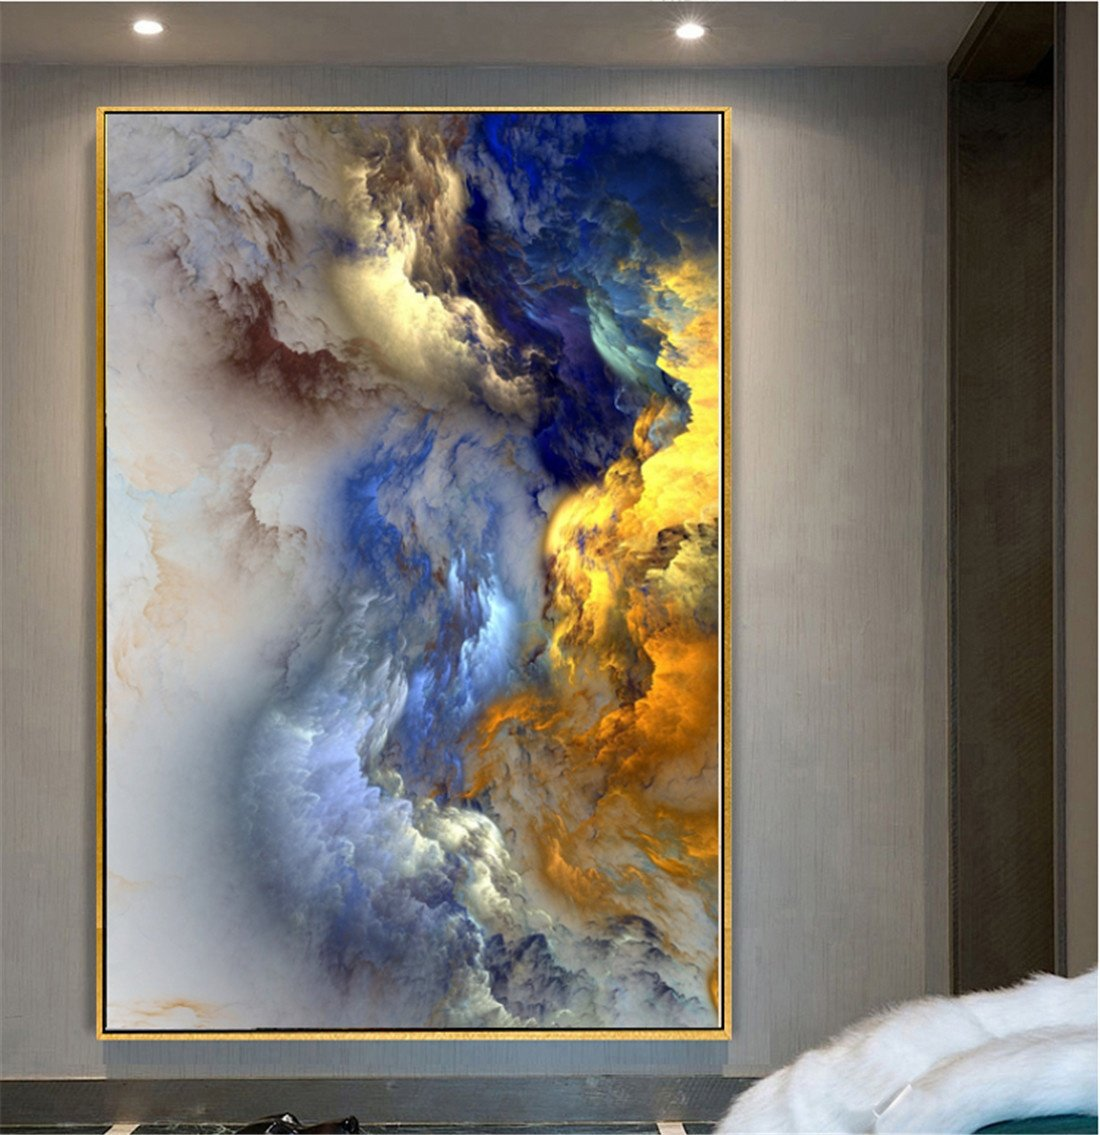 Barato MIWENNebulosa de Concha Dormitorio Moderno Restaurante Pinturas Pinturas Pinturas Murales Sala de Estar Pintura Decorativa Corredor Decorativo Pintura Abstracta (75  50cm) bcfea8